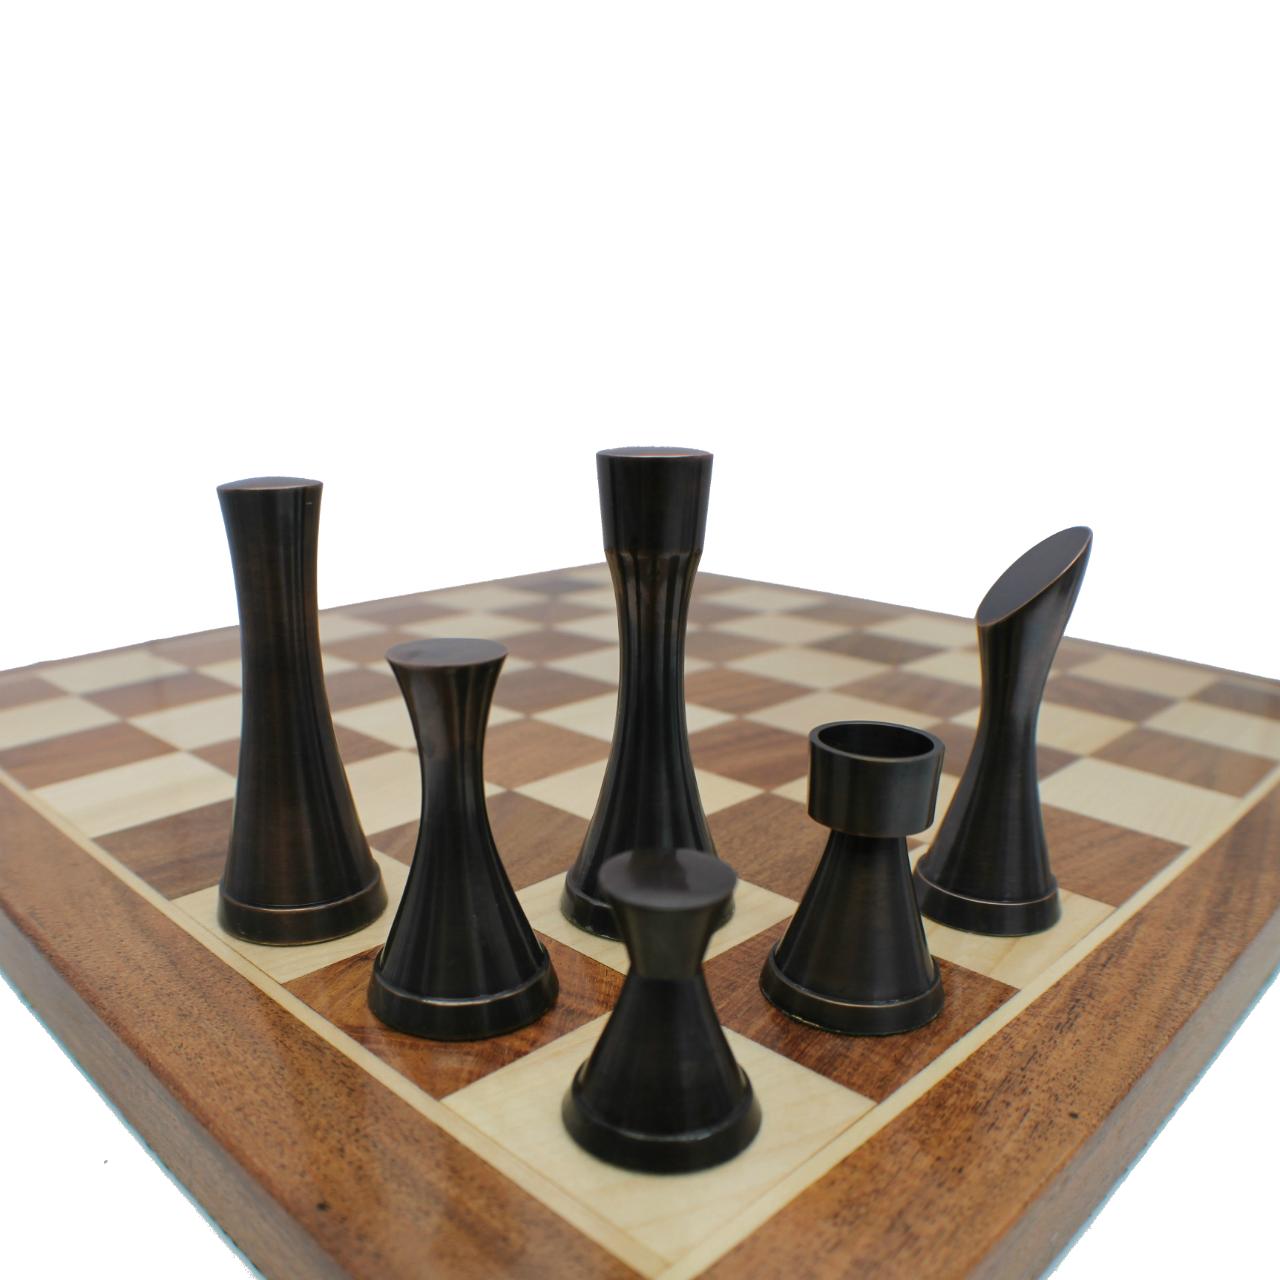 Rex Noir Prestige Contemporary Design Metal / Brass Chess Pieces (PRE-CON-95) dark